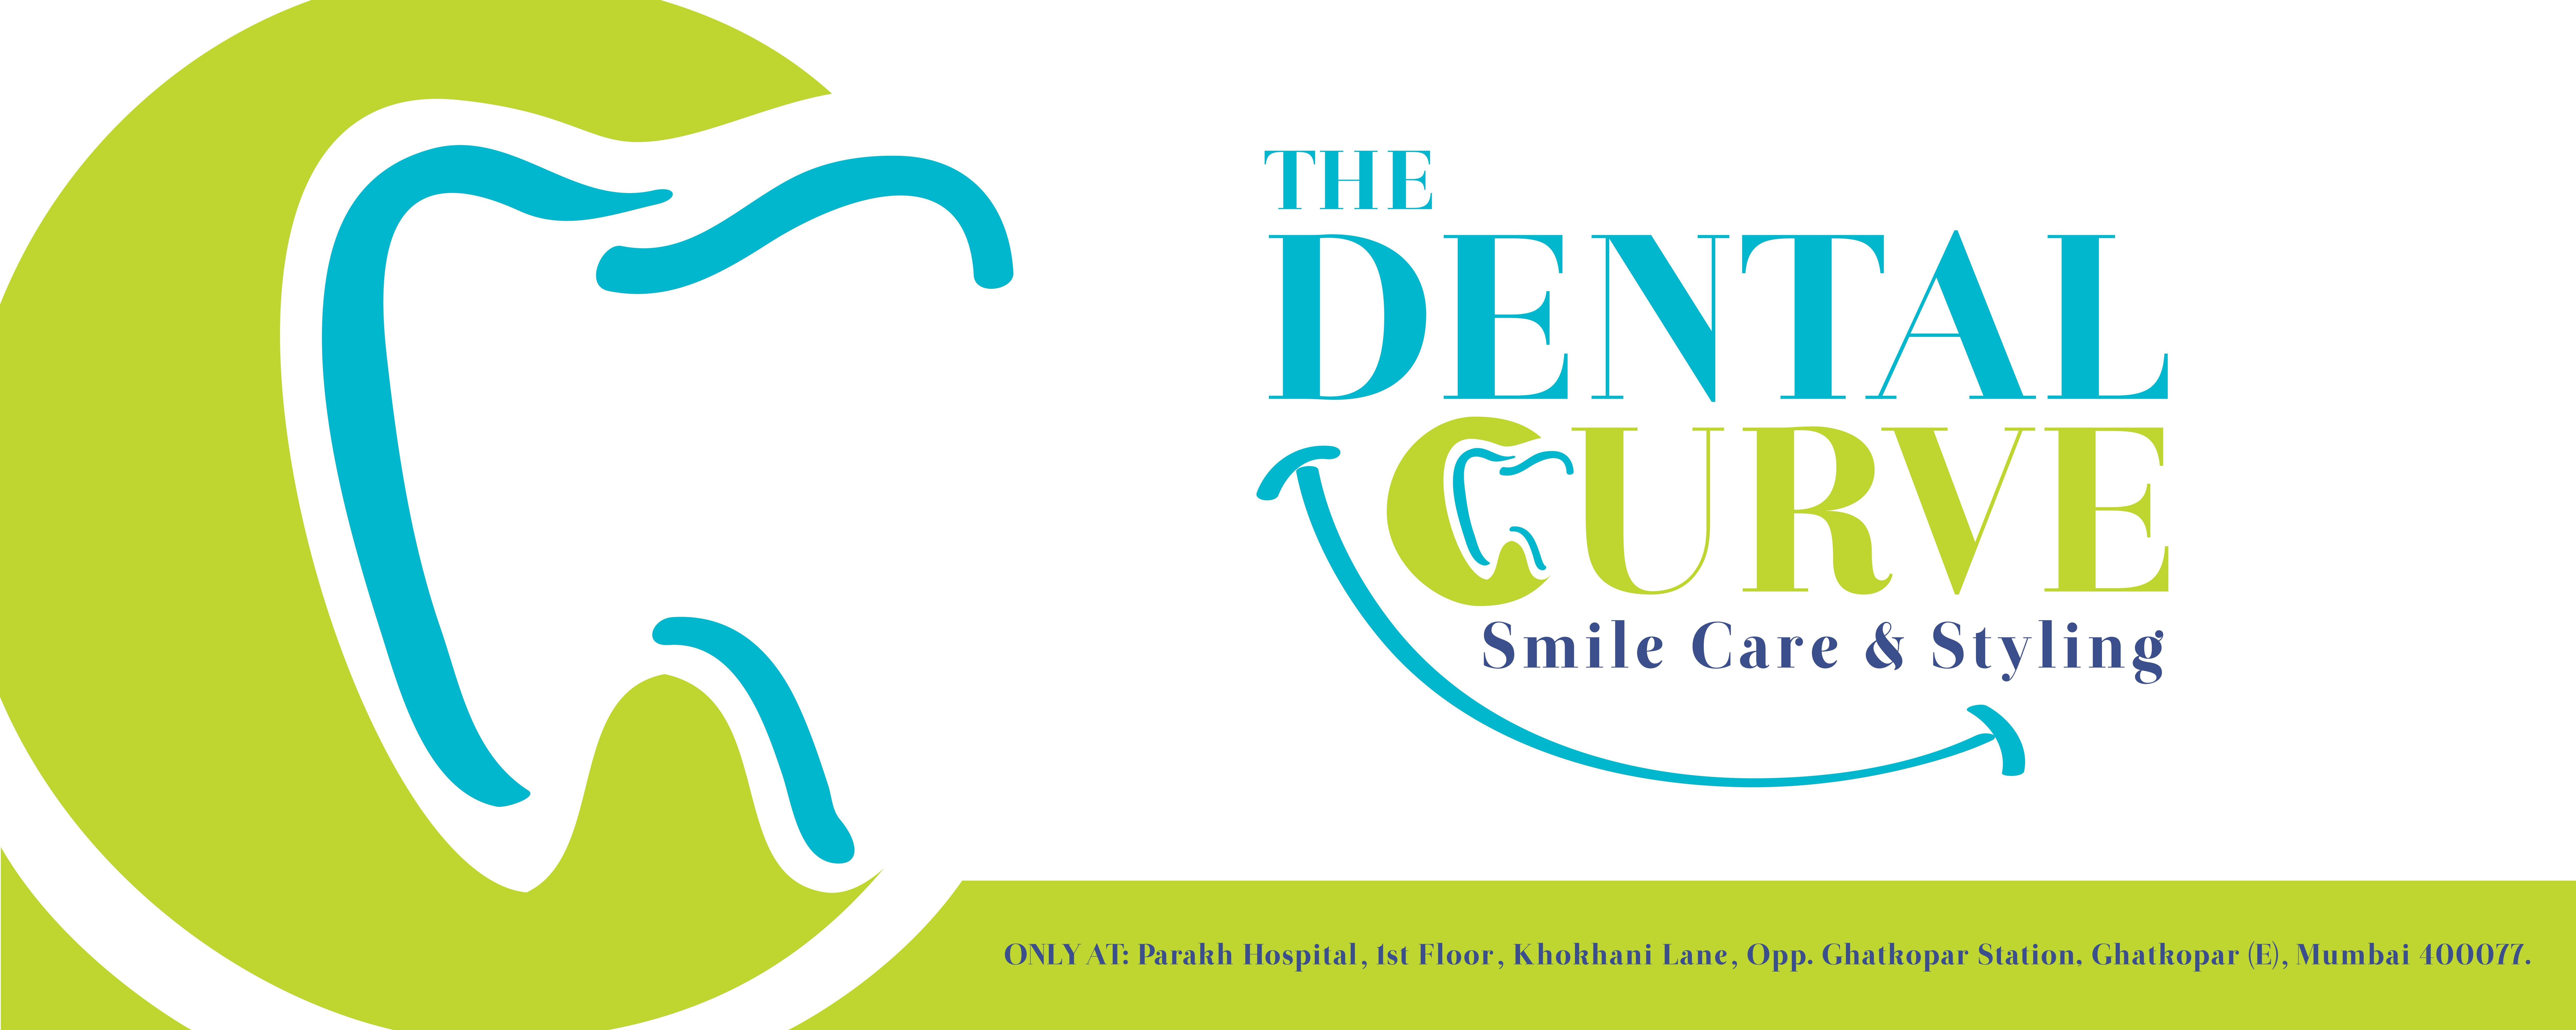 The Dental Curve